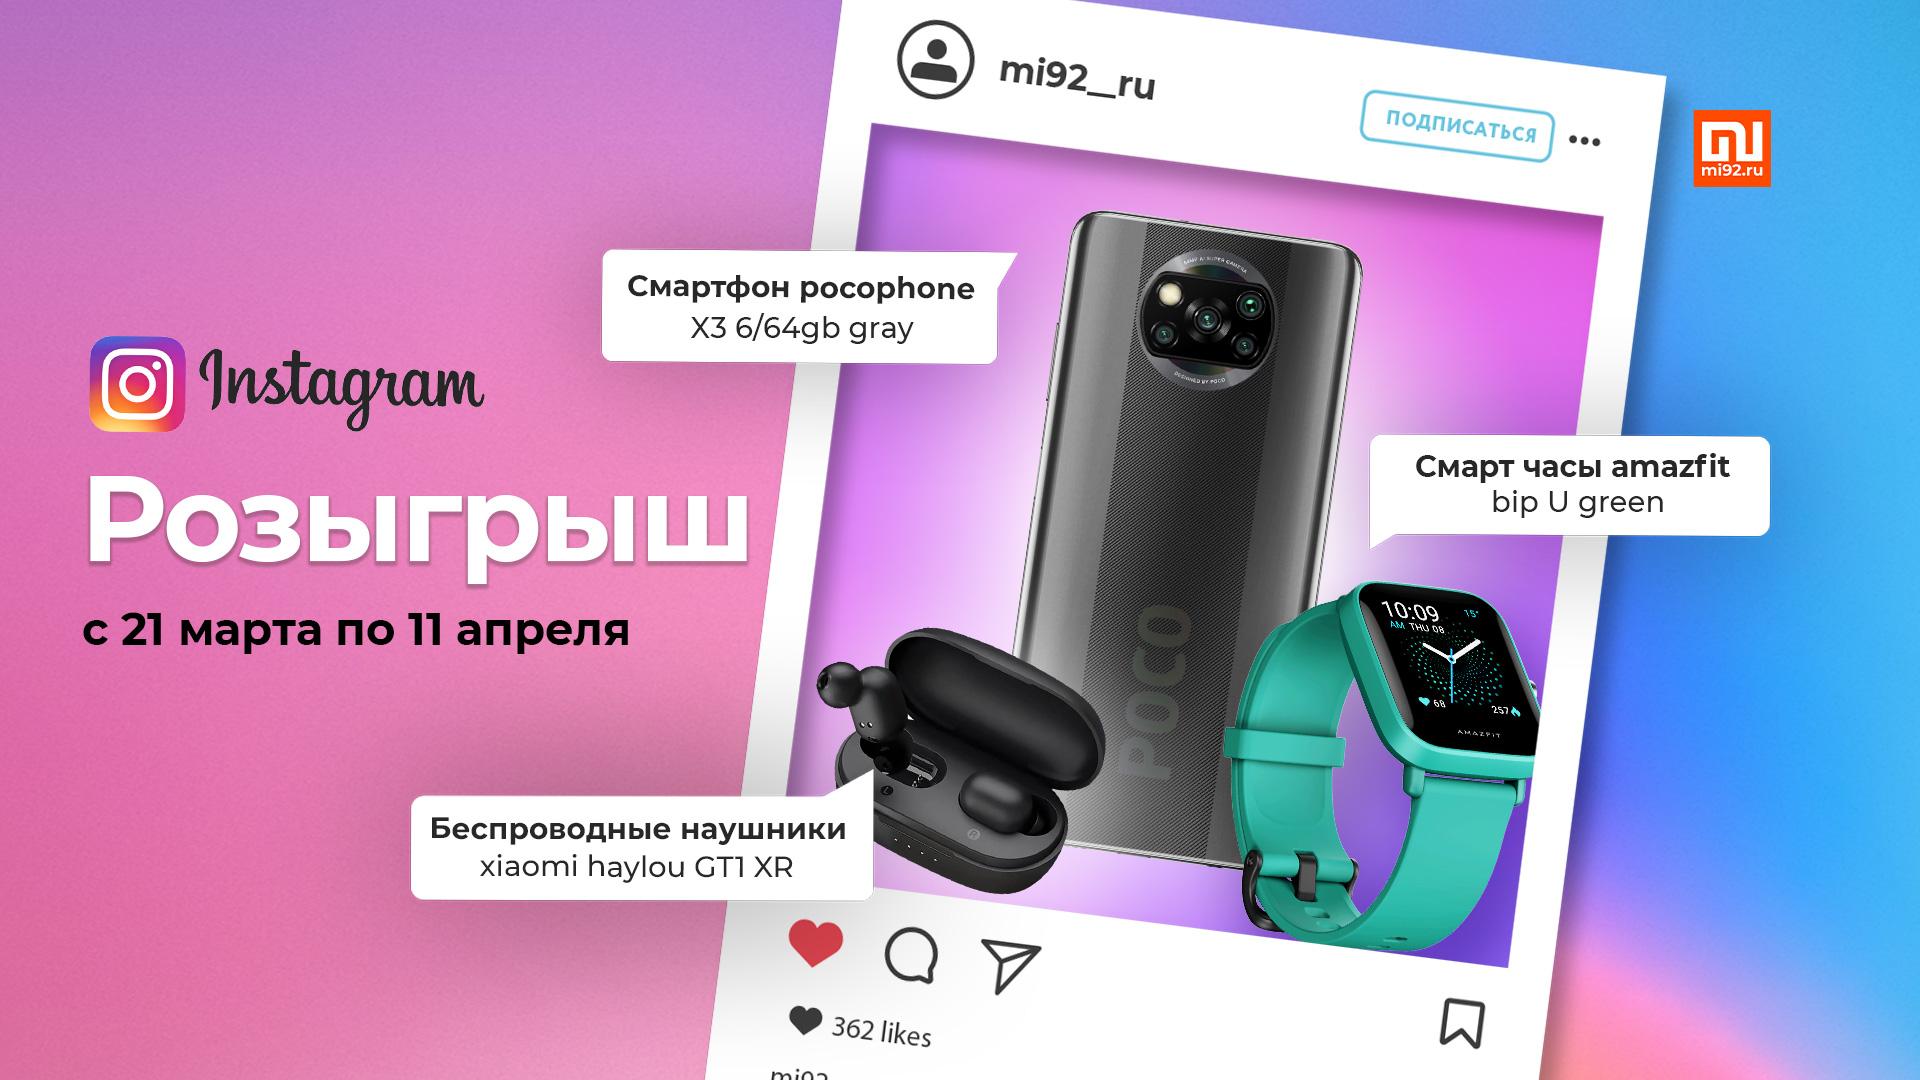 Instagram Roz Banner Promo2